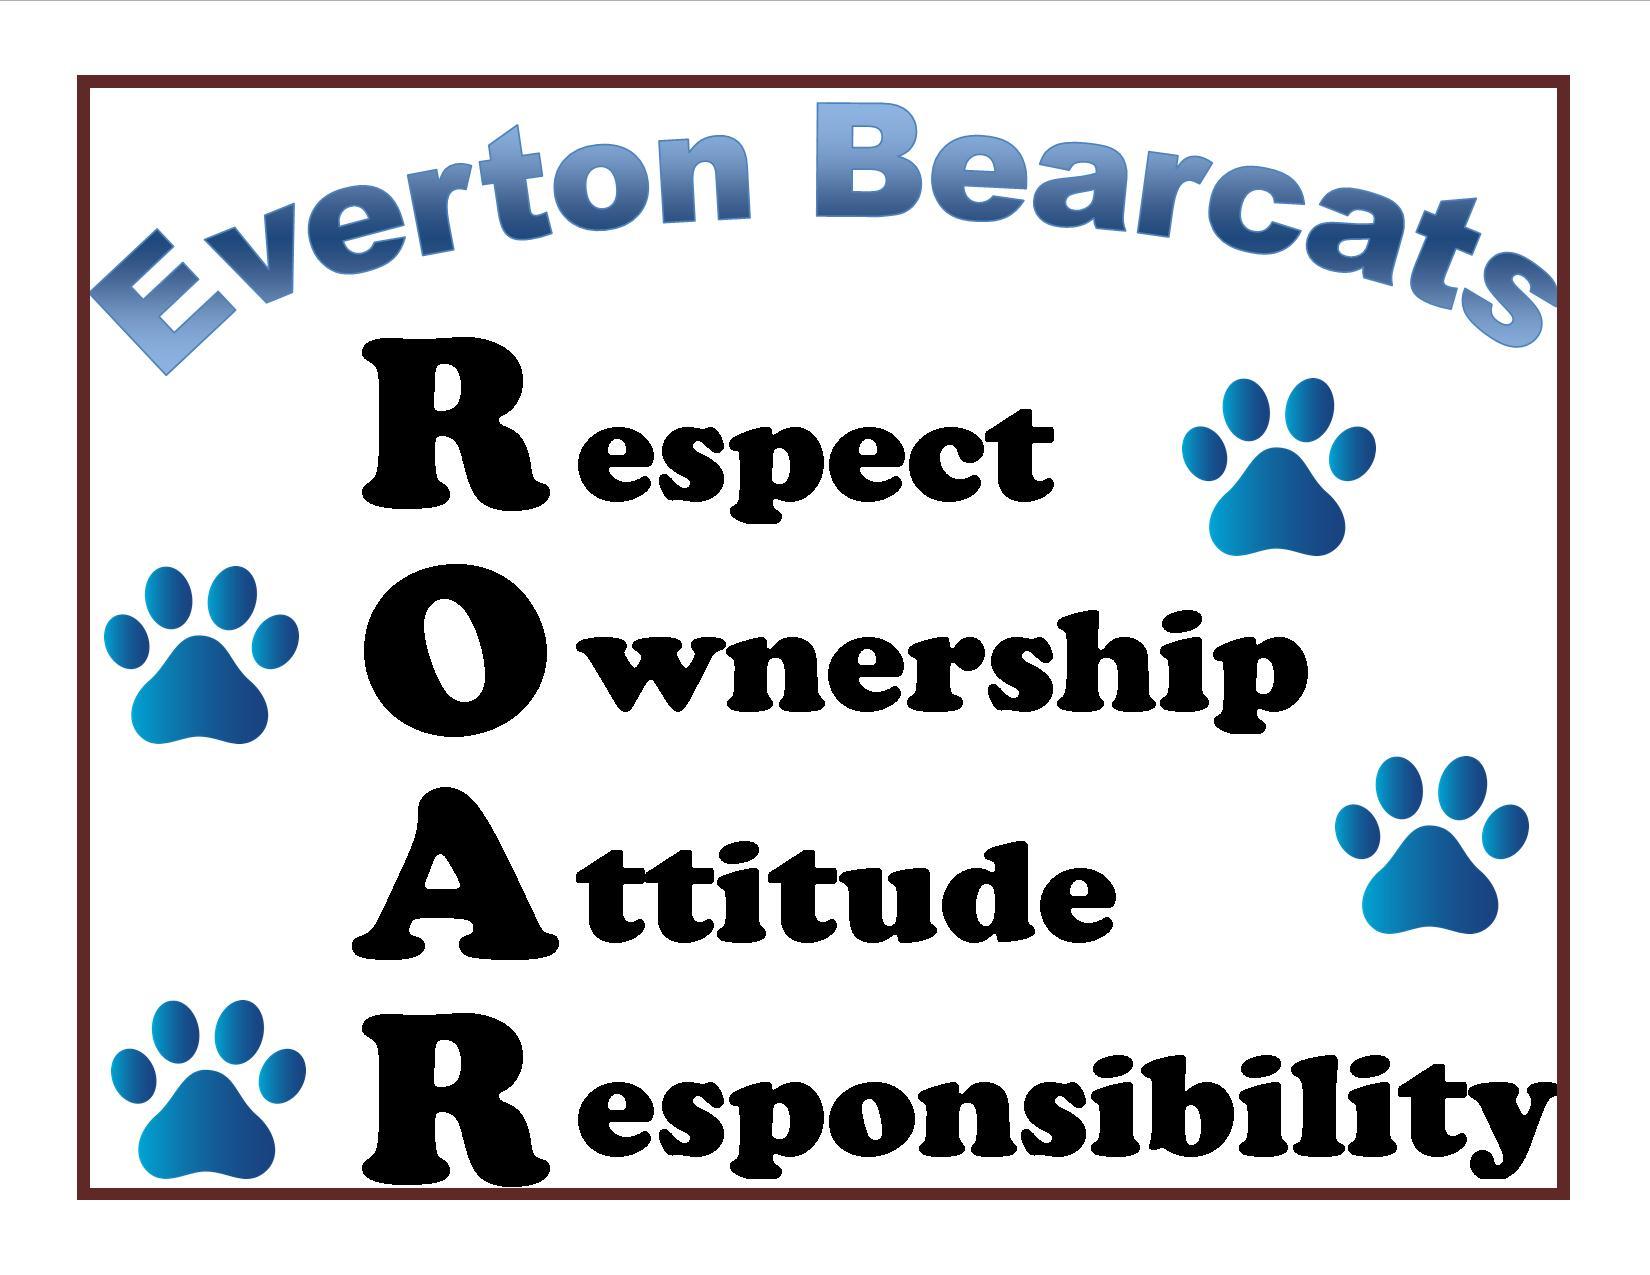 Everton Bearcats Respect Ownership Attitude Responsibility